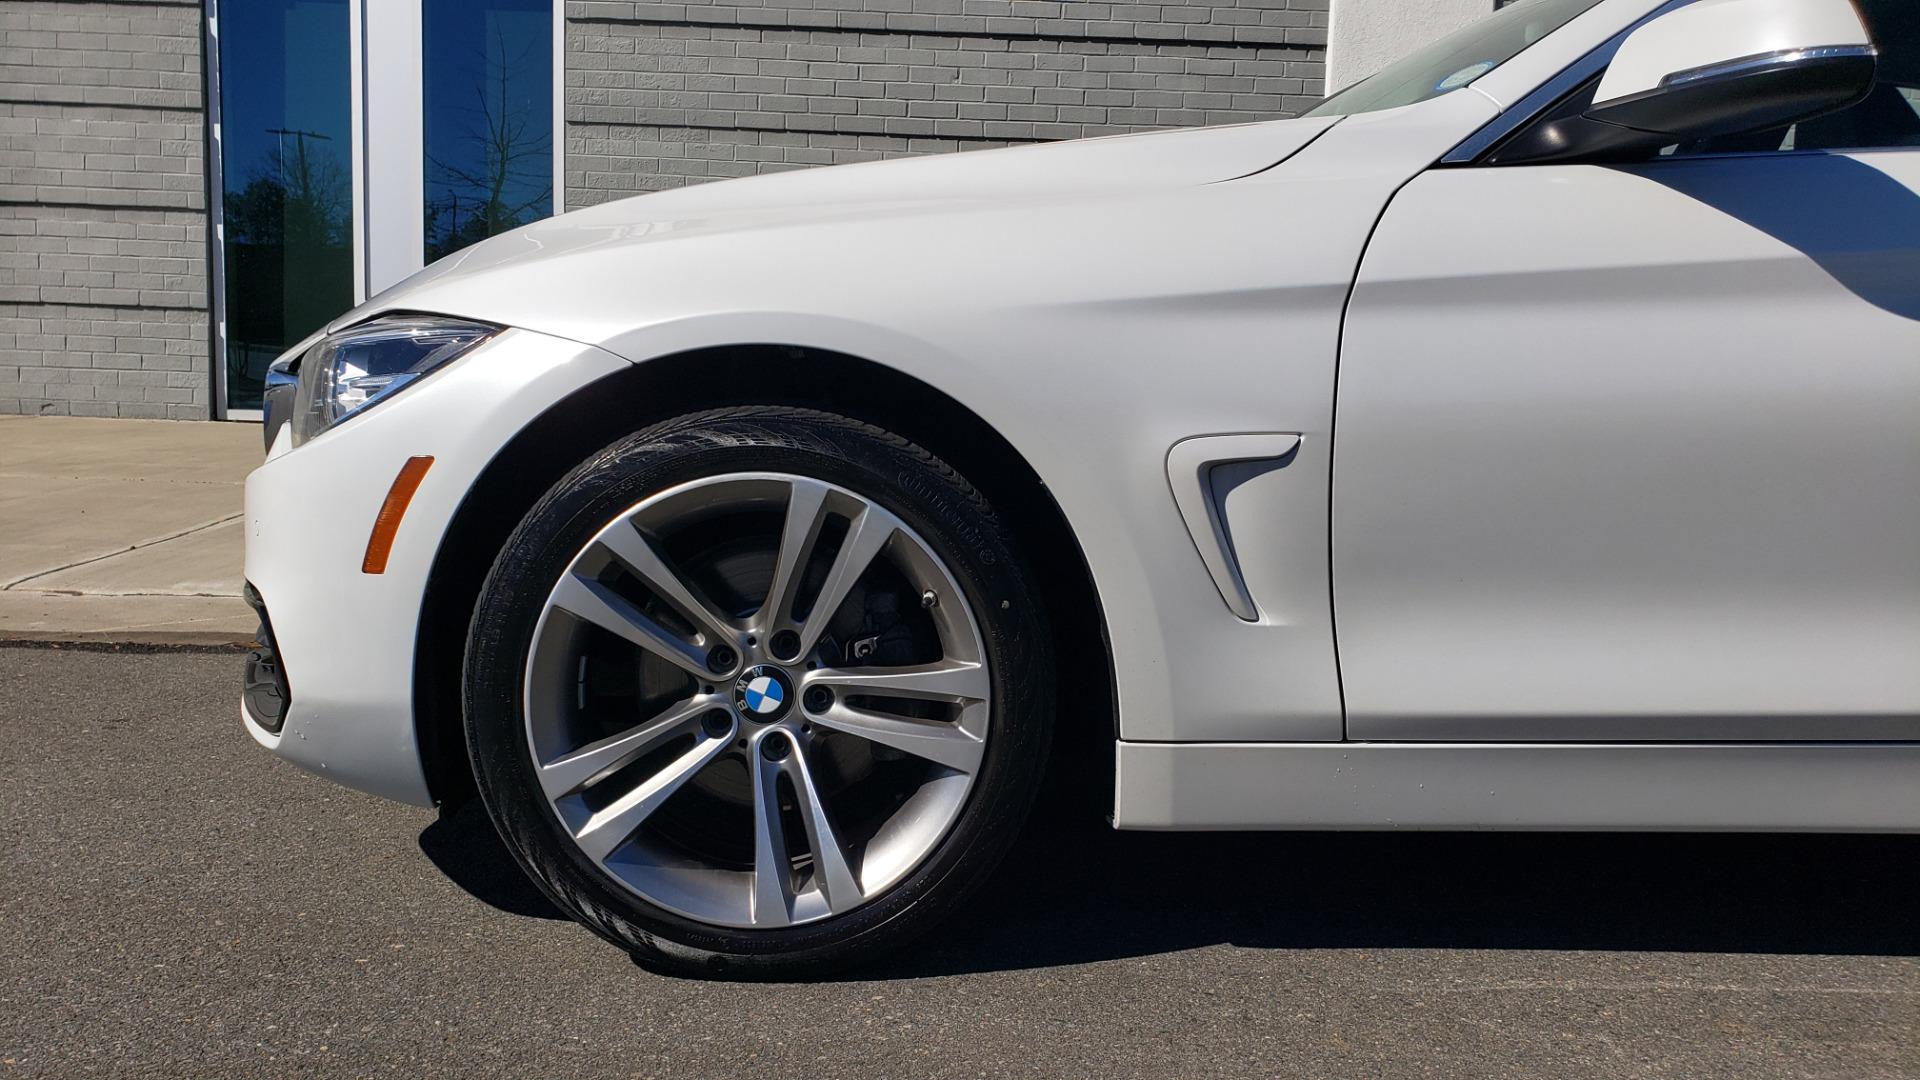 Used 2018 BMW 4 SERIES 430IXDRIVE / PREMIUM / NAV / SUNROOF / ESSENTIALS PKG for sale $27,795 at Formula Imports in Charlotte NC 28227 82